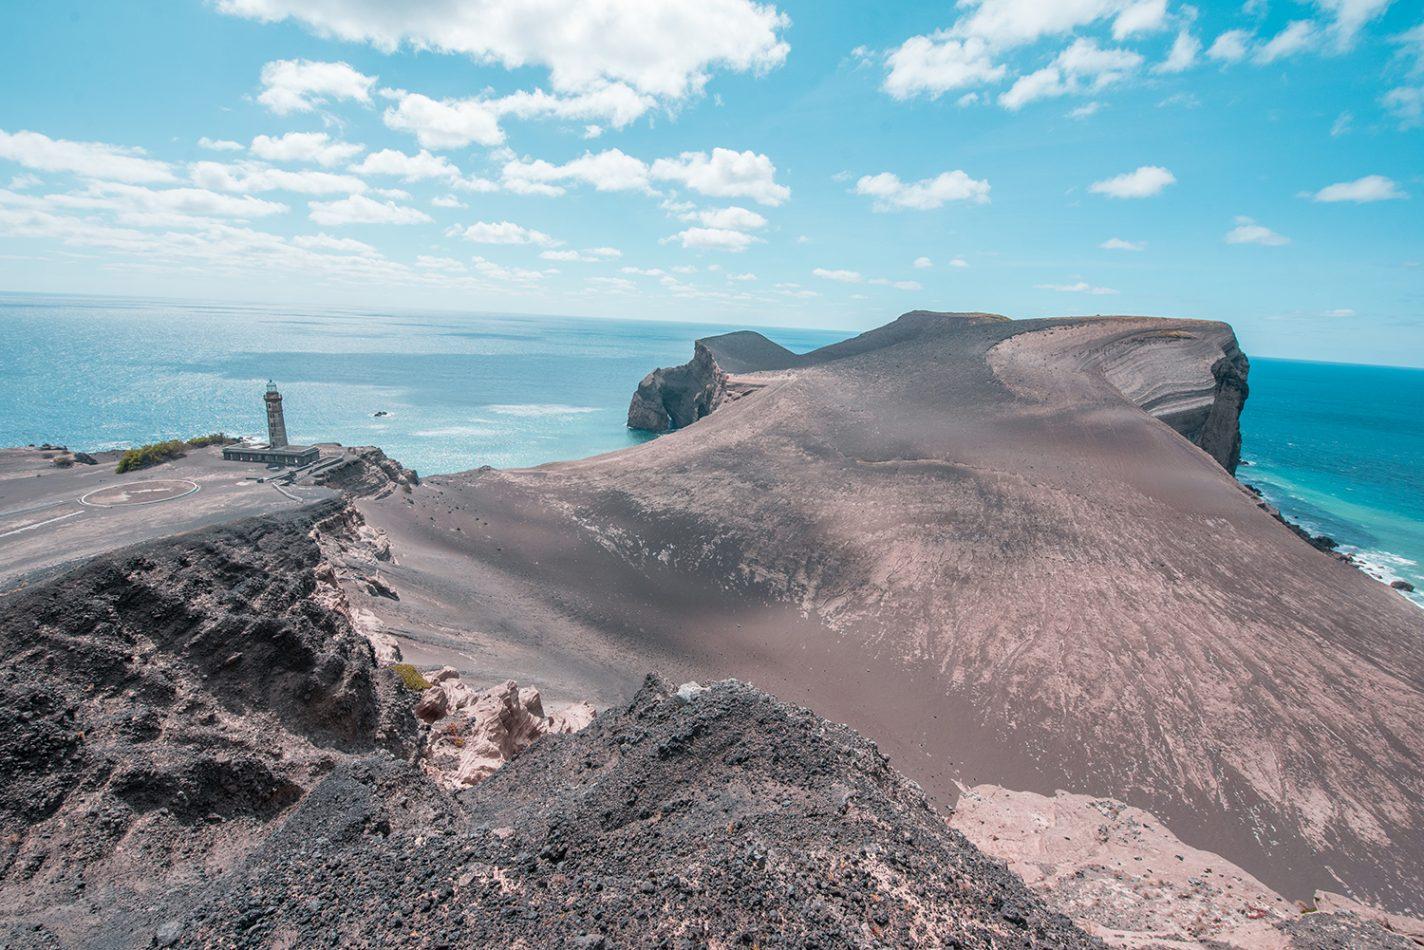 De Capelinhos vulkaan